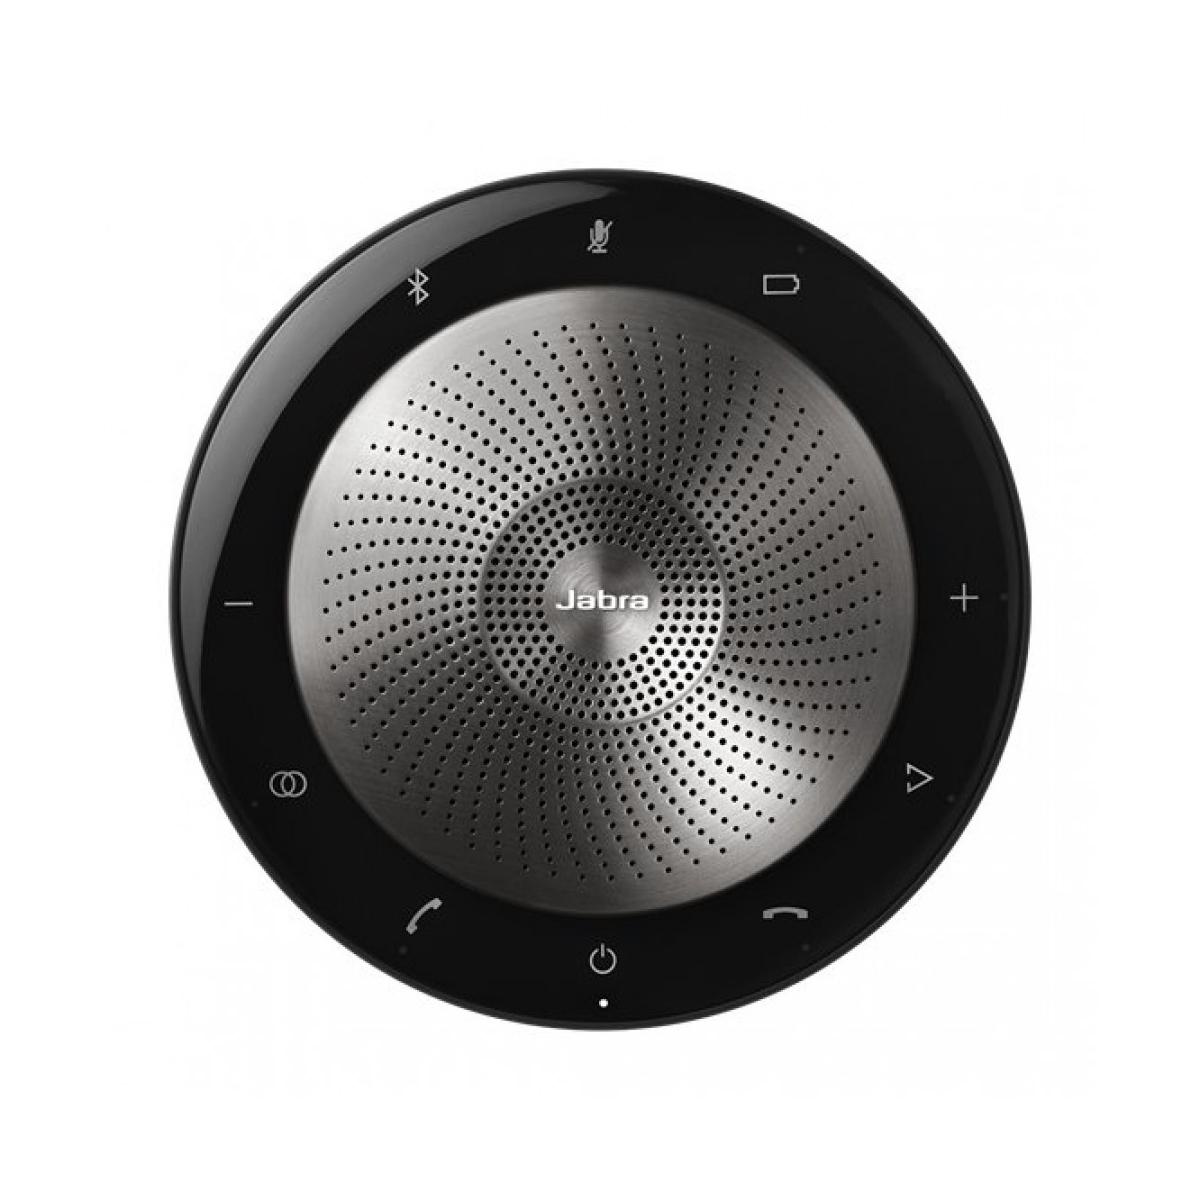 Jabra Speak 710 UC with USB and Bluetooth Portable Speakerphone